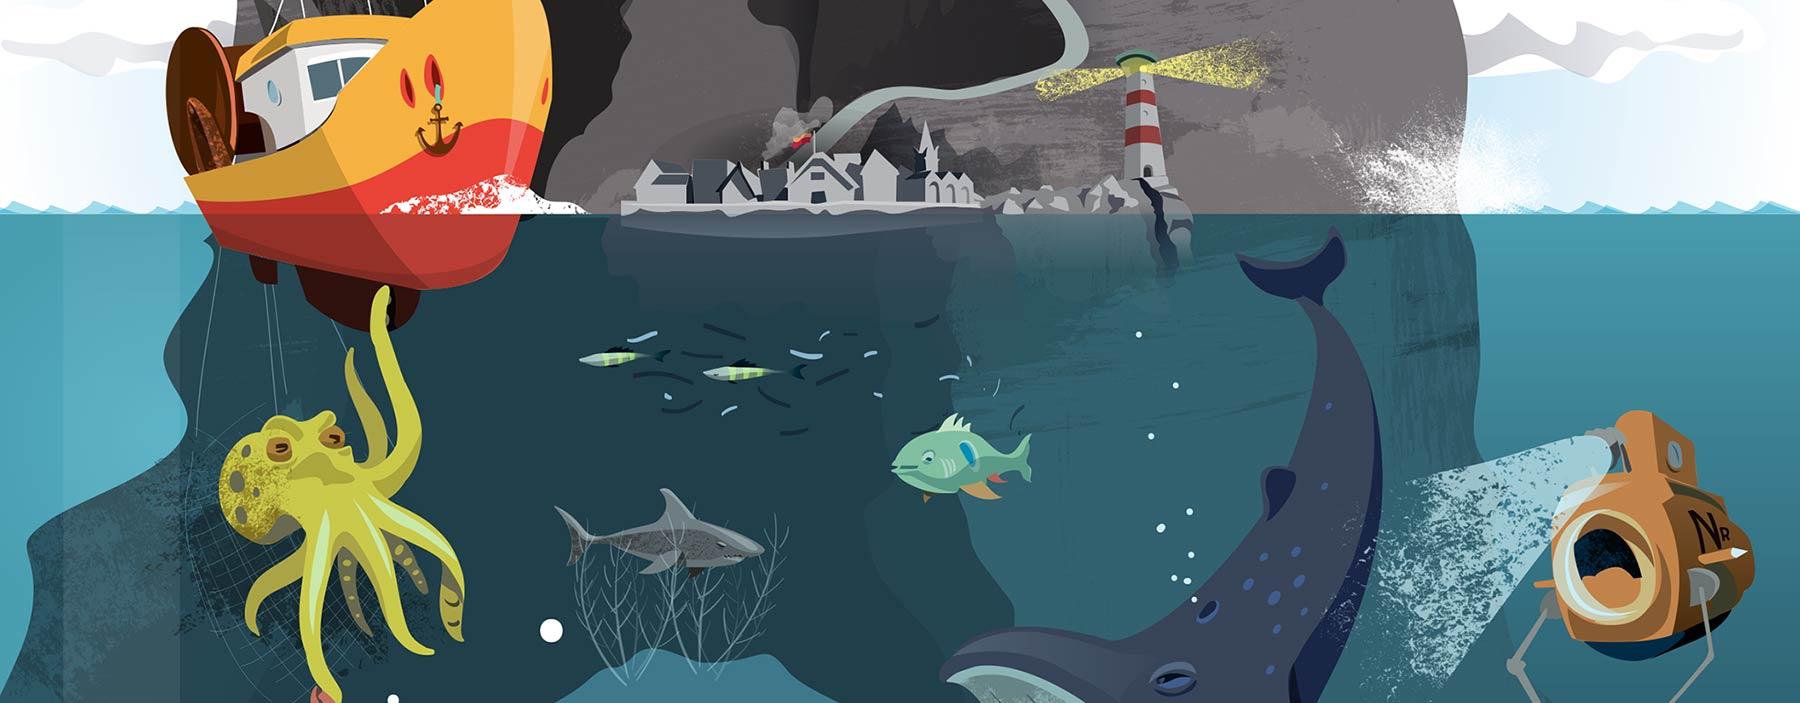 Kids Storytelling Poster of Undersea World